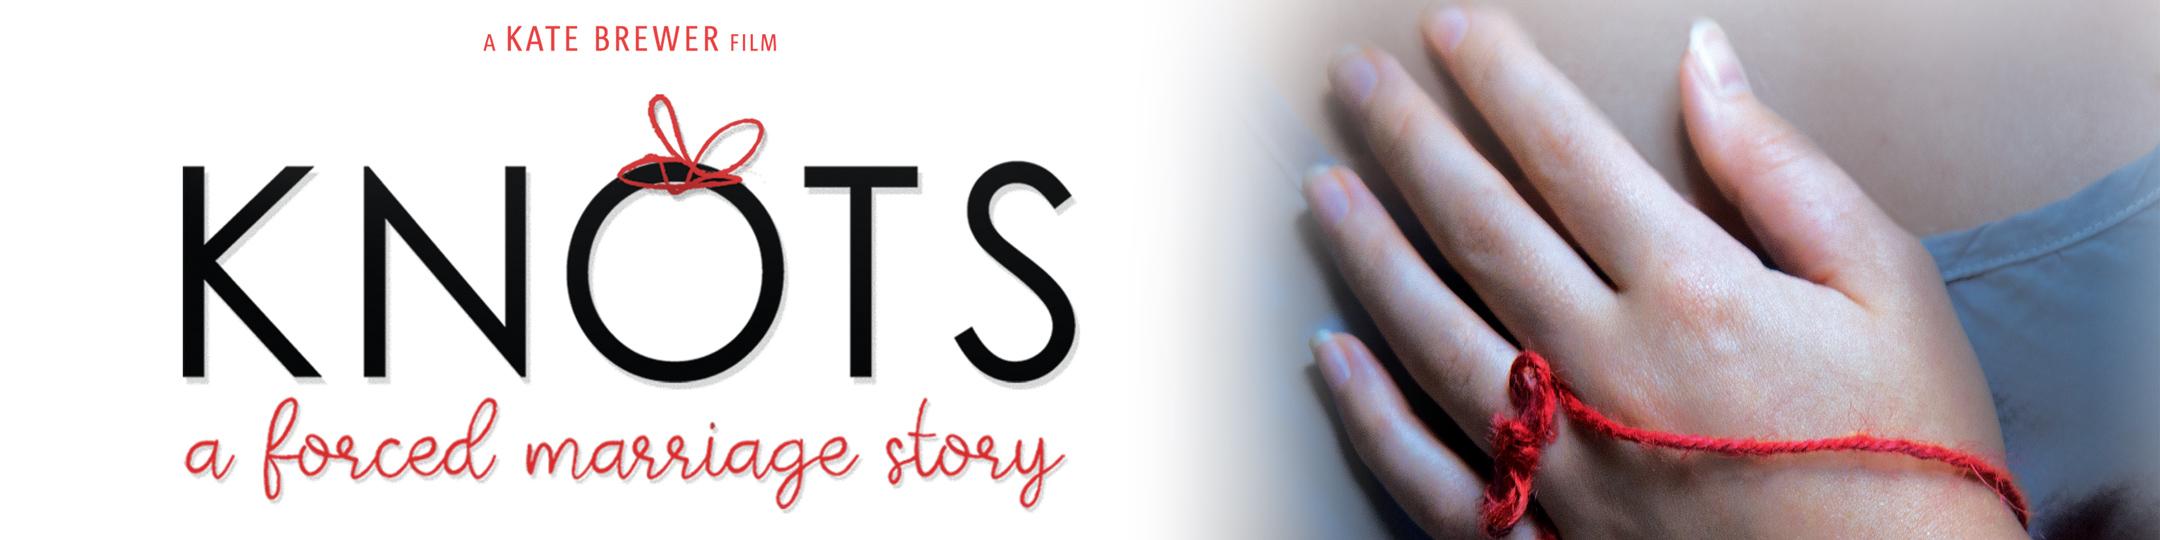 KnotsAFMS-banner-web